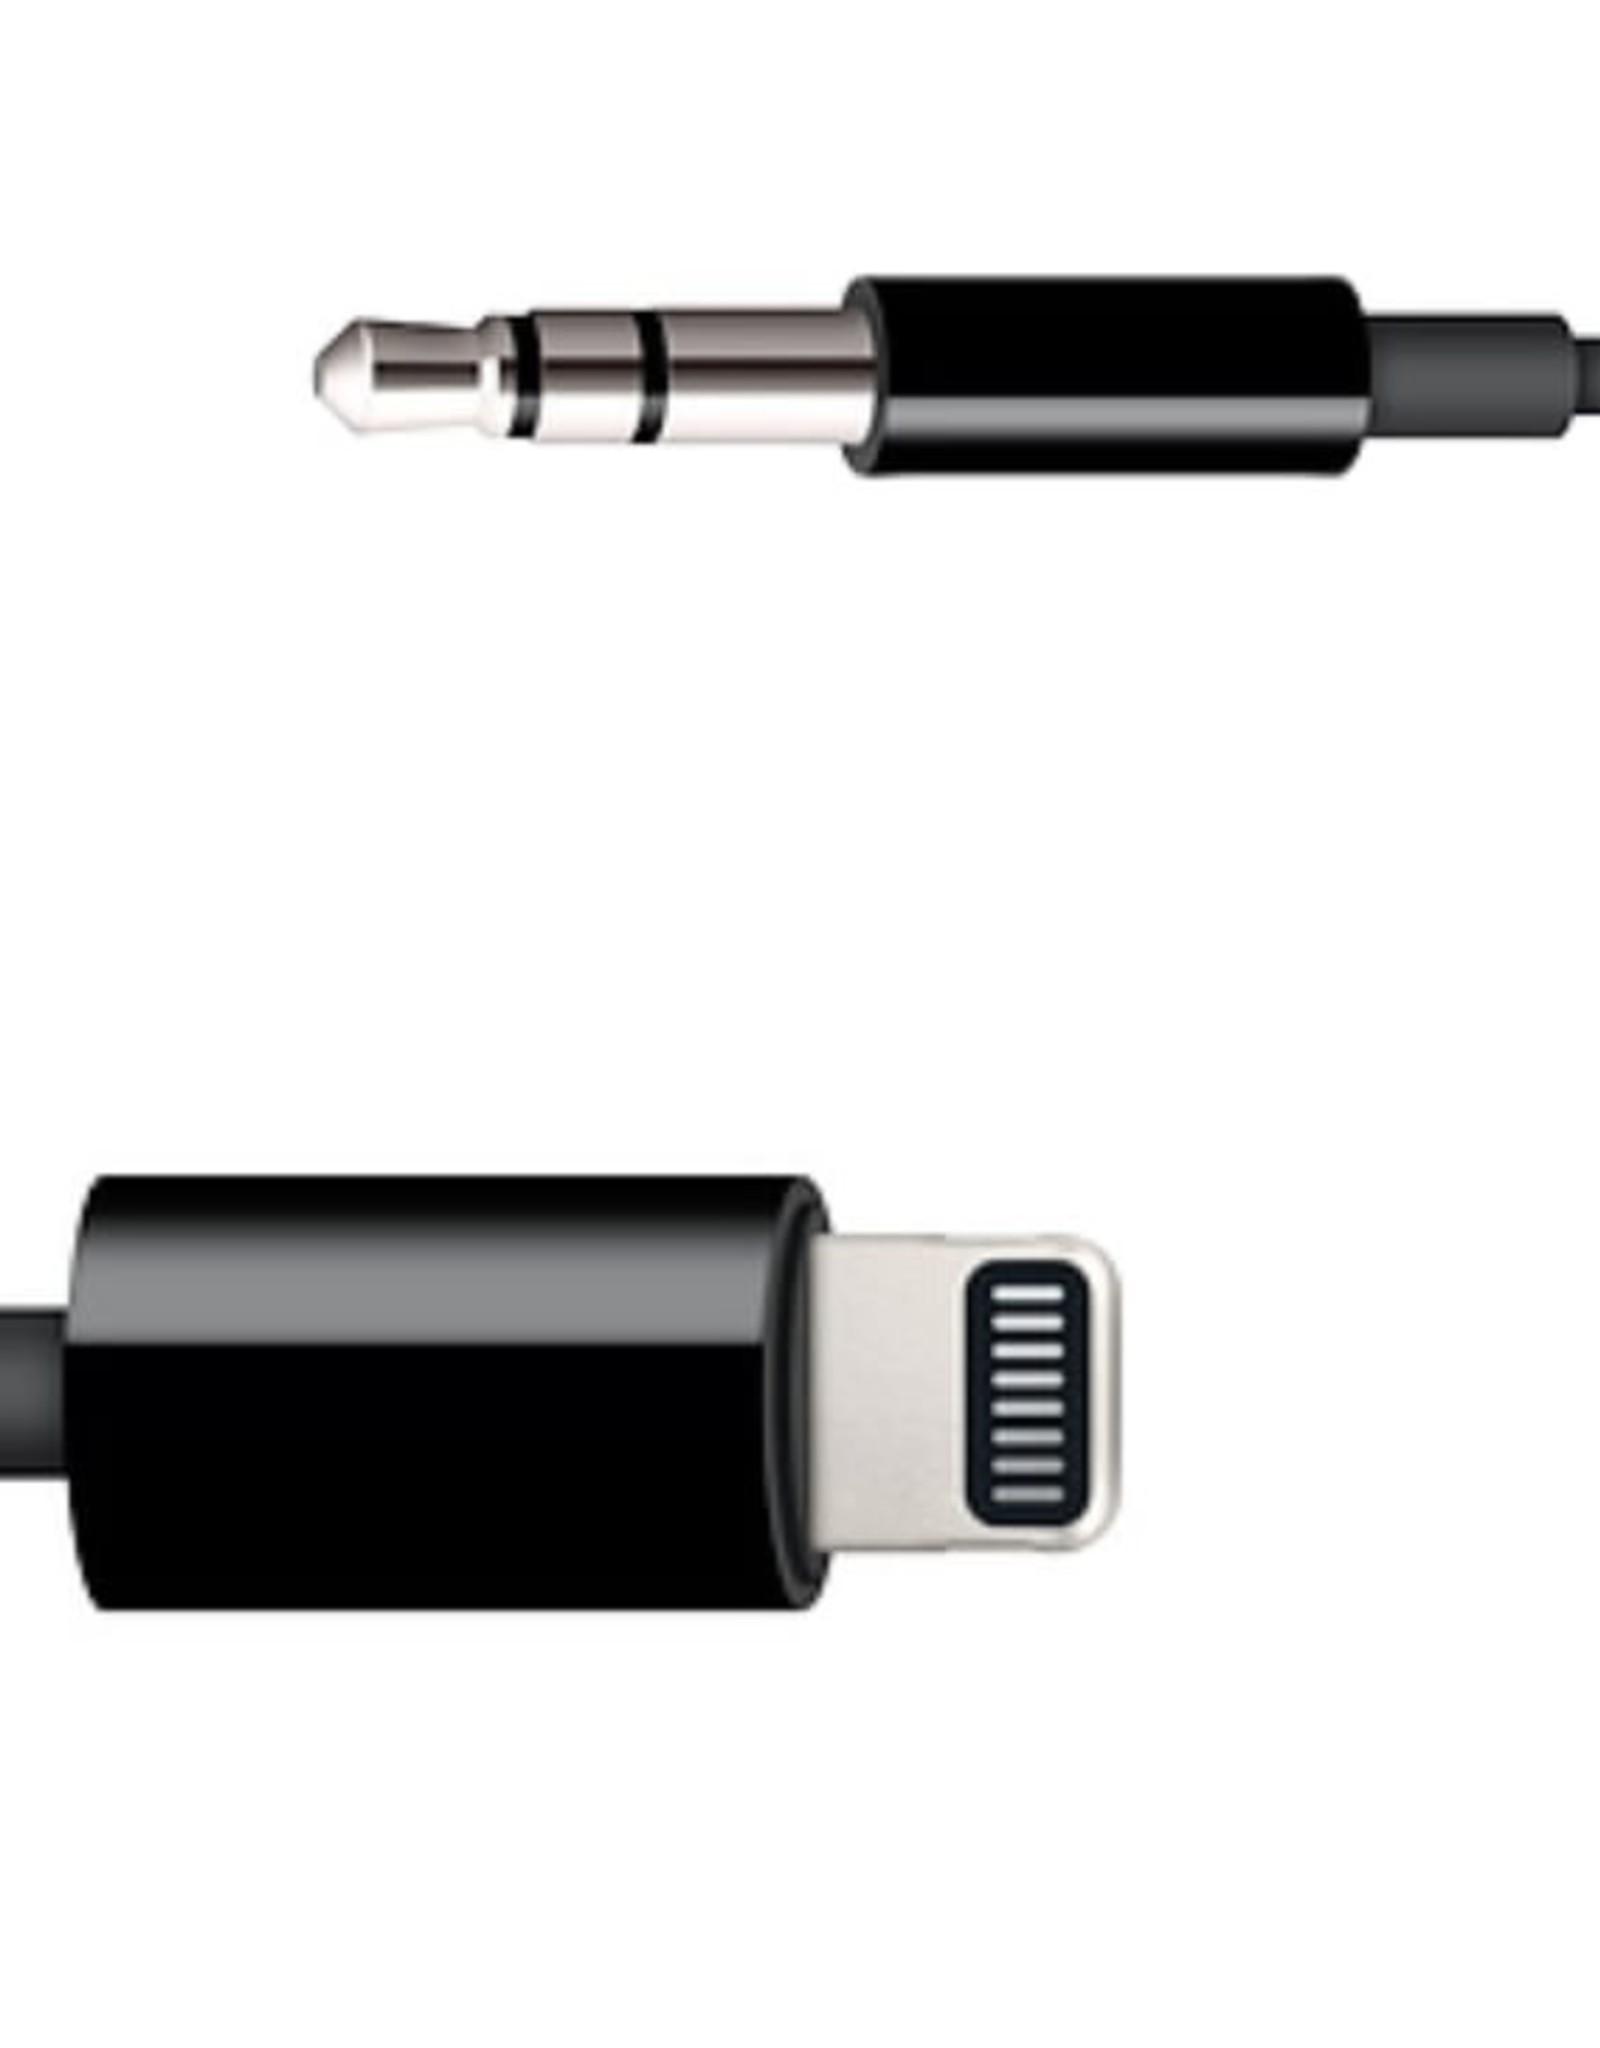 Lightning to 3.5 mm Audio Jack